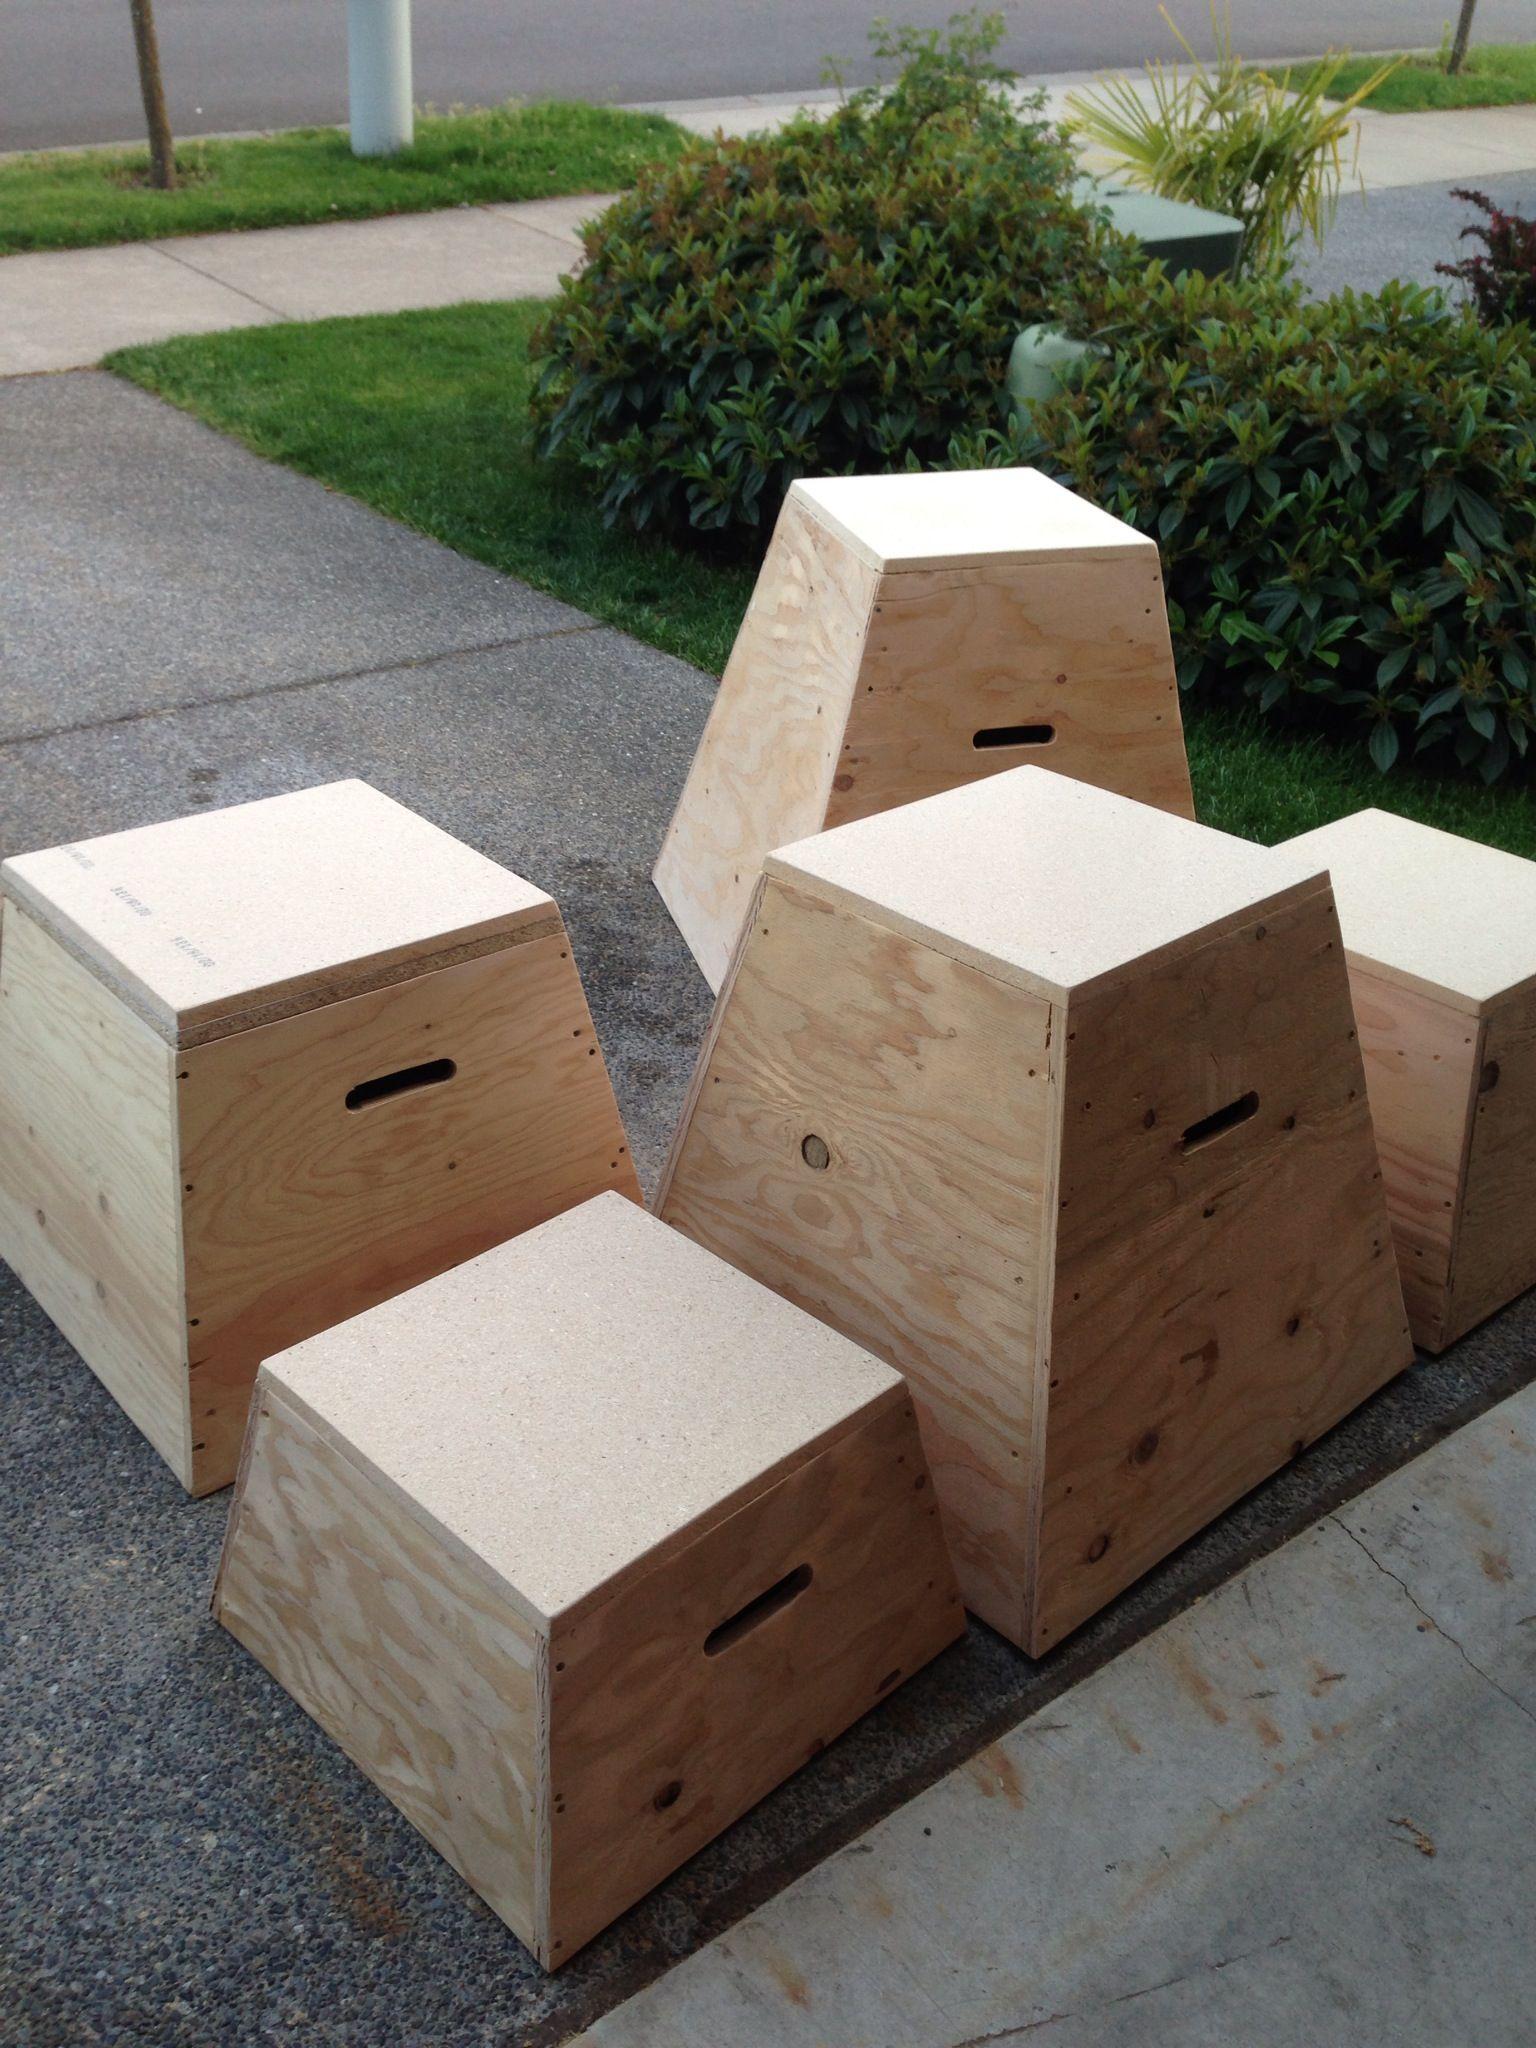 Plyo crossfit jump boxes diy home ideas at home gym diy home